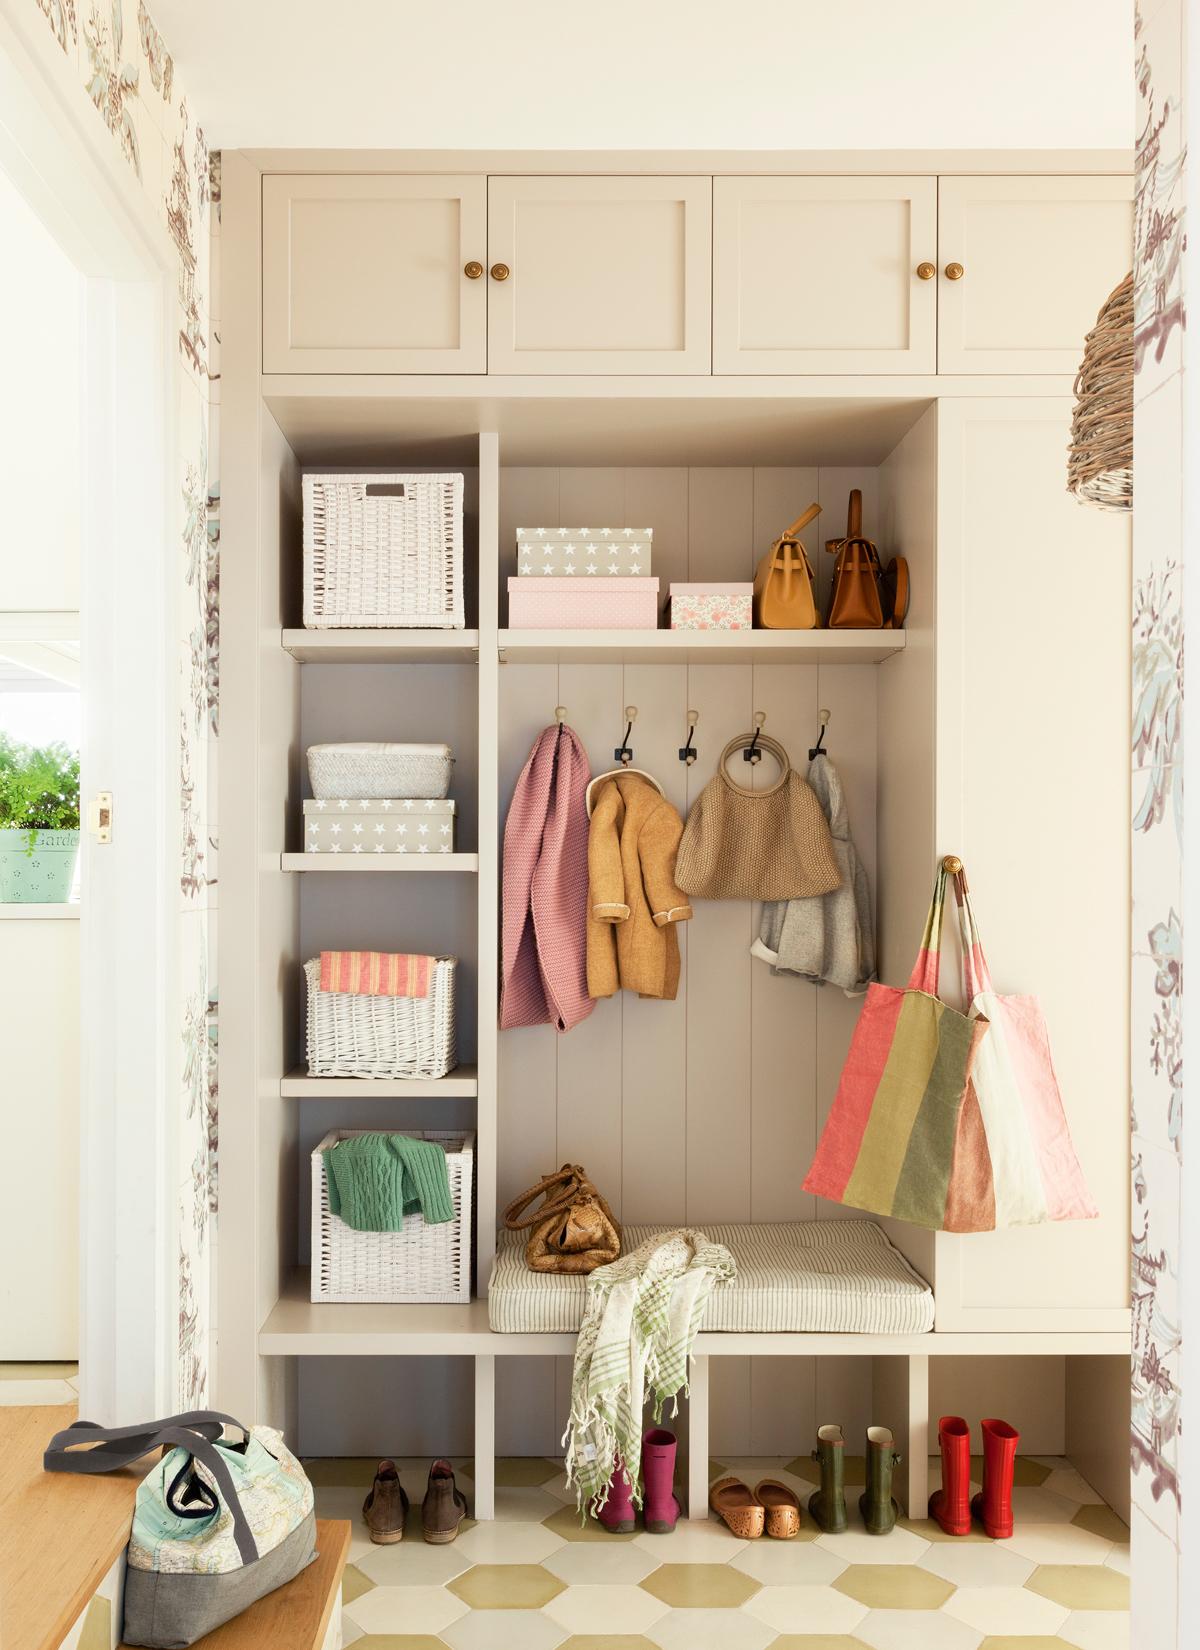 10 ideas geniales para recibidores peque os for Muebles con cestas